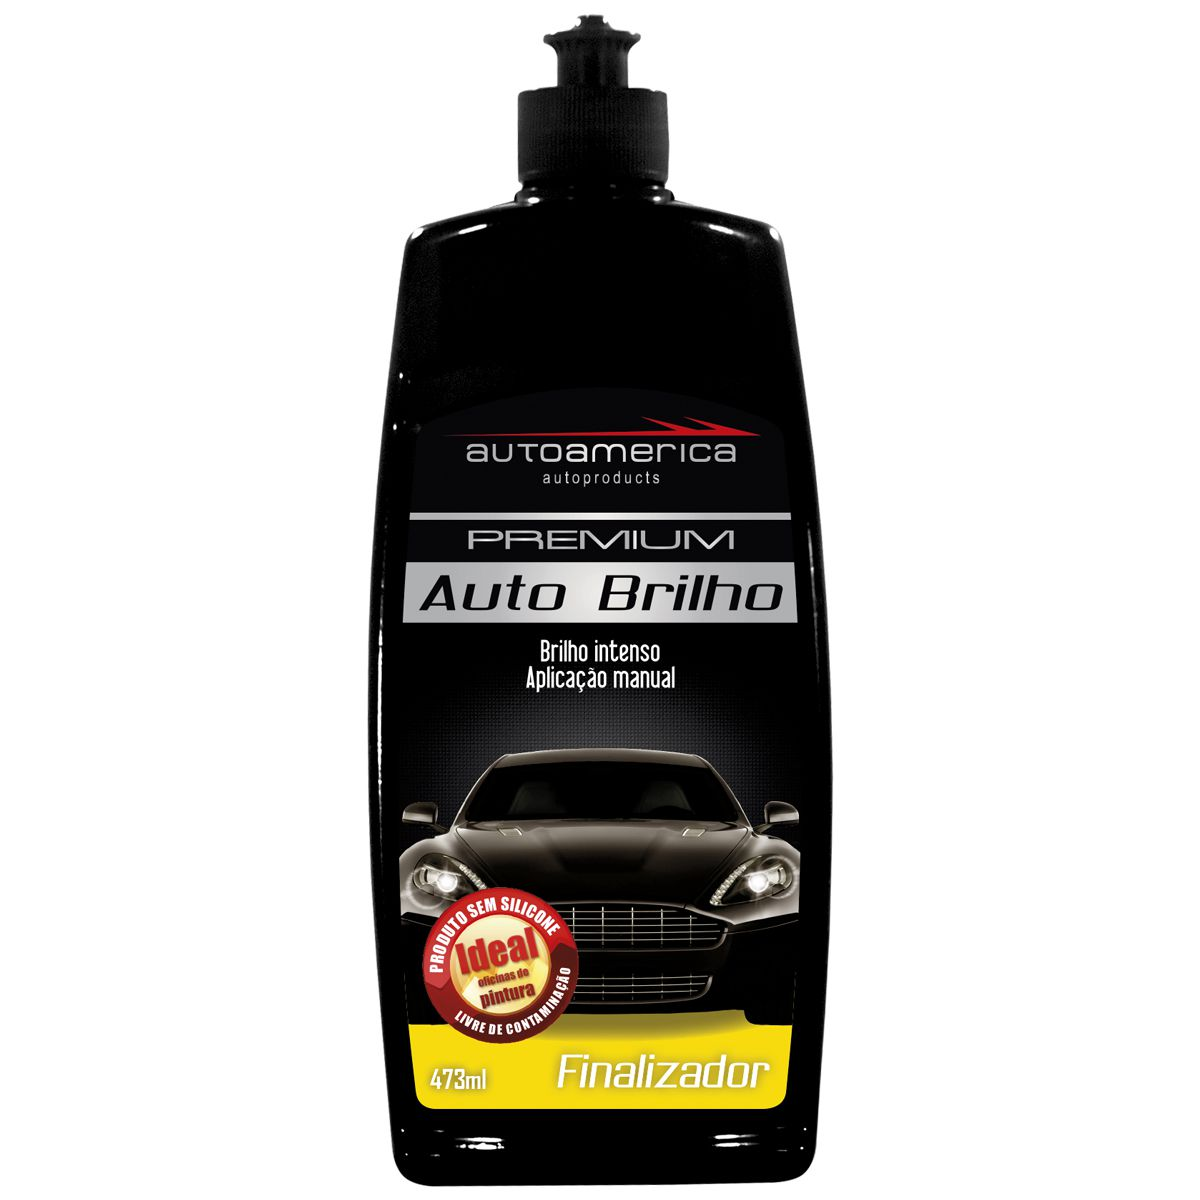 Auto Brilho Premium Finalizador Autoamerica 473ml